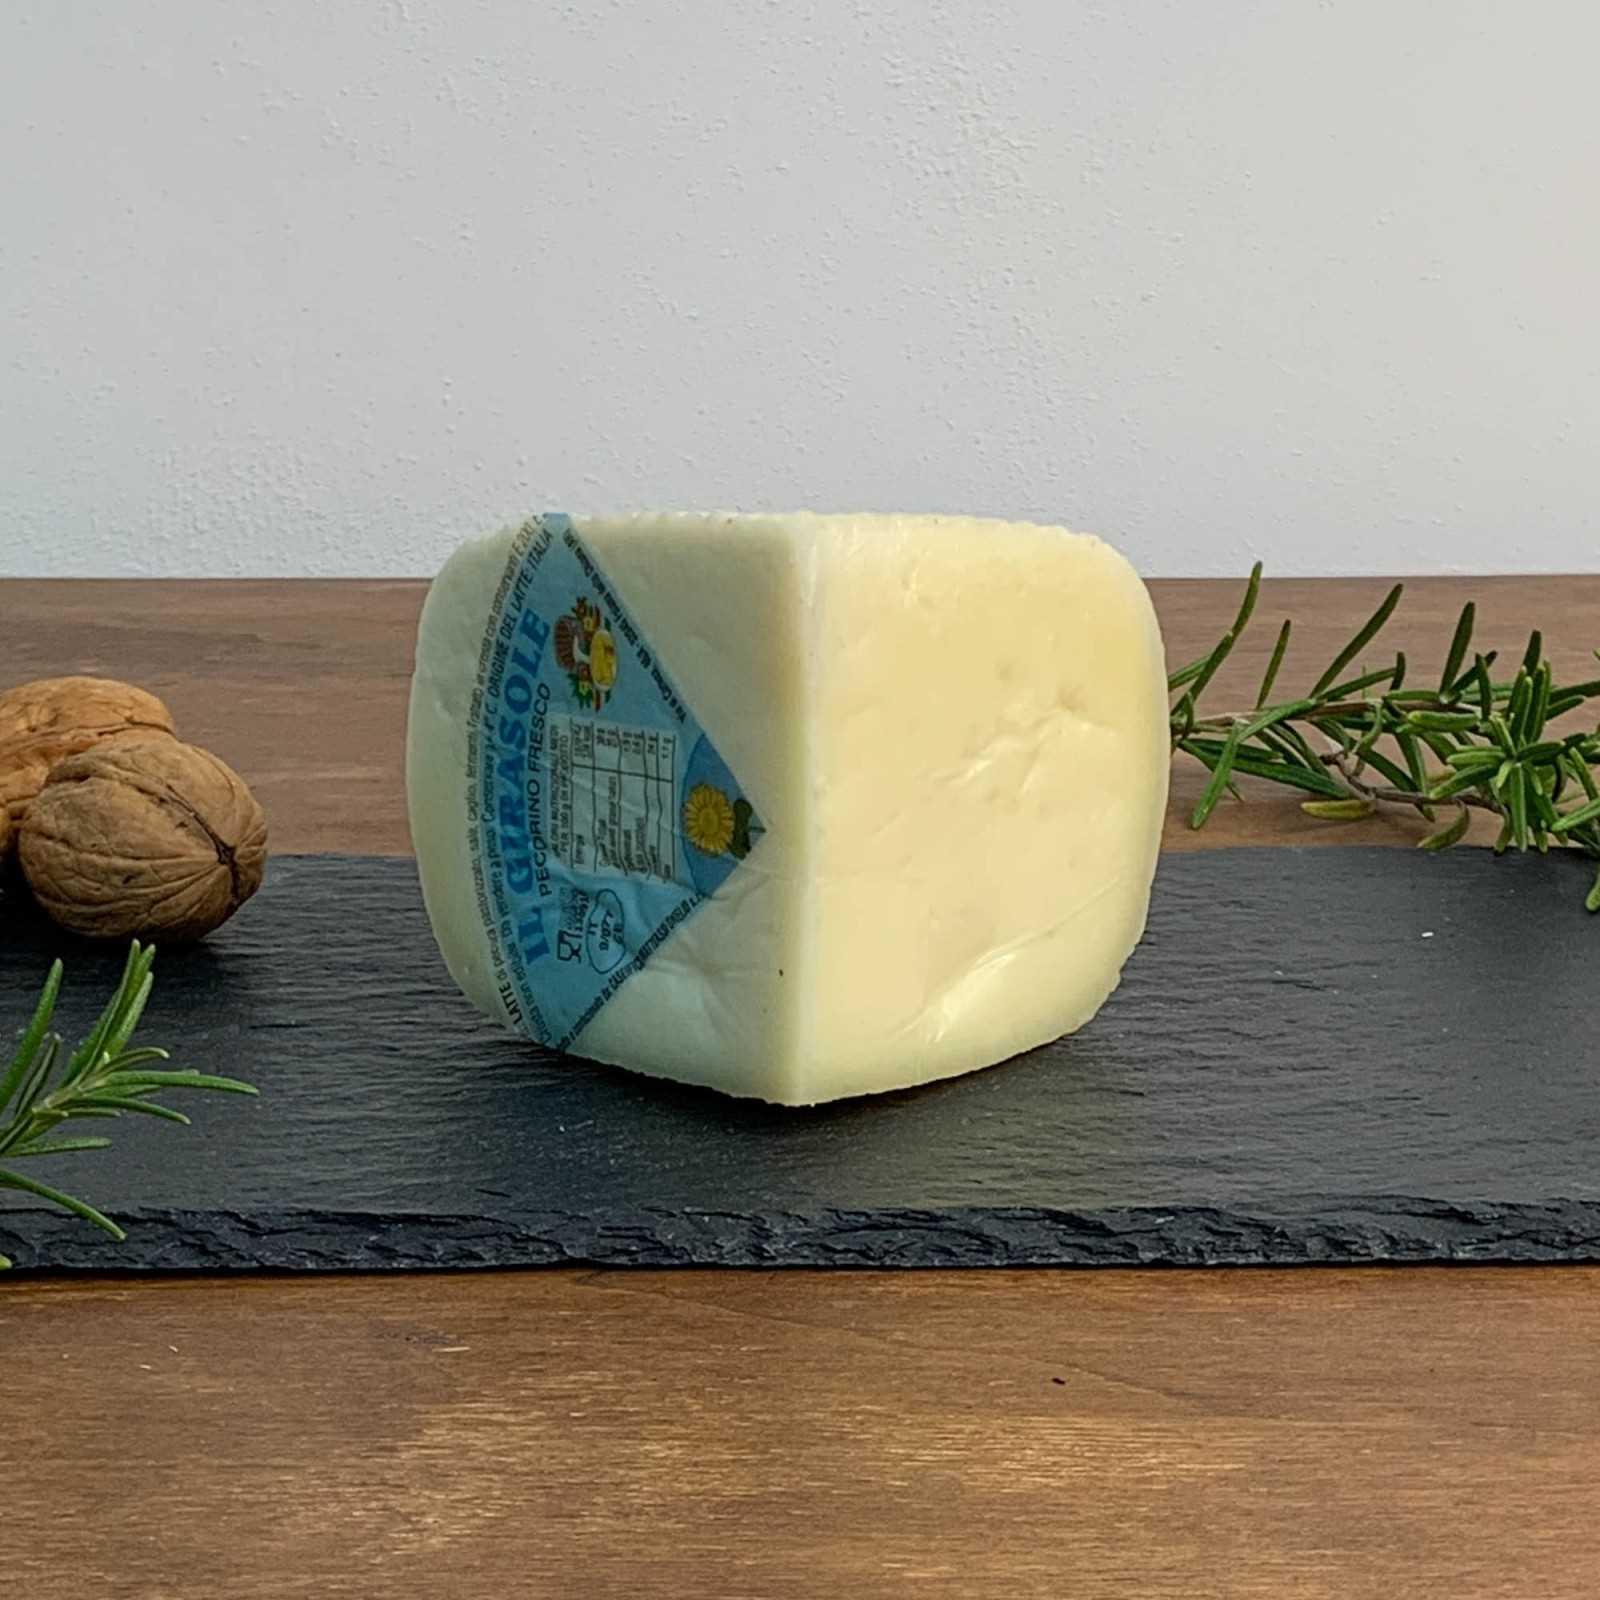 Frischer toskanische Pecorino-Käse.